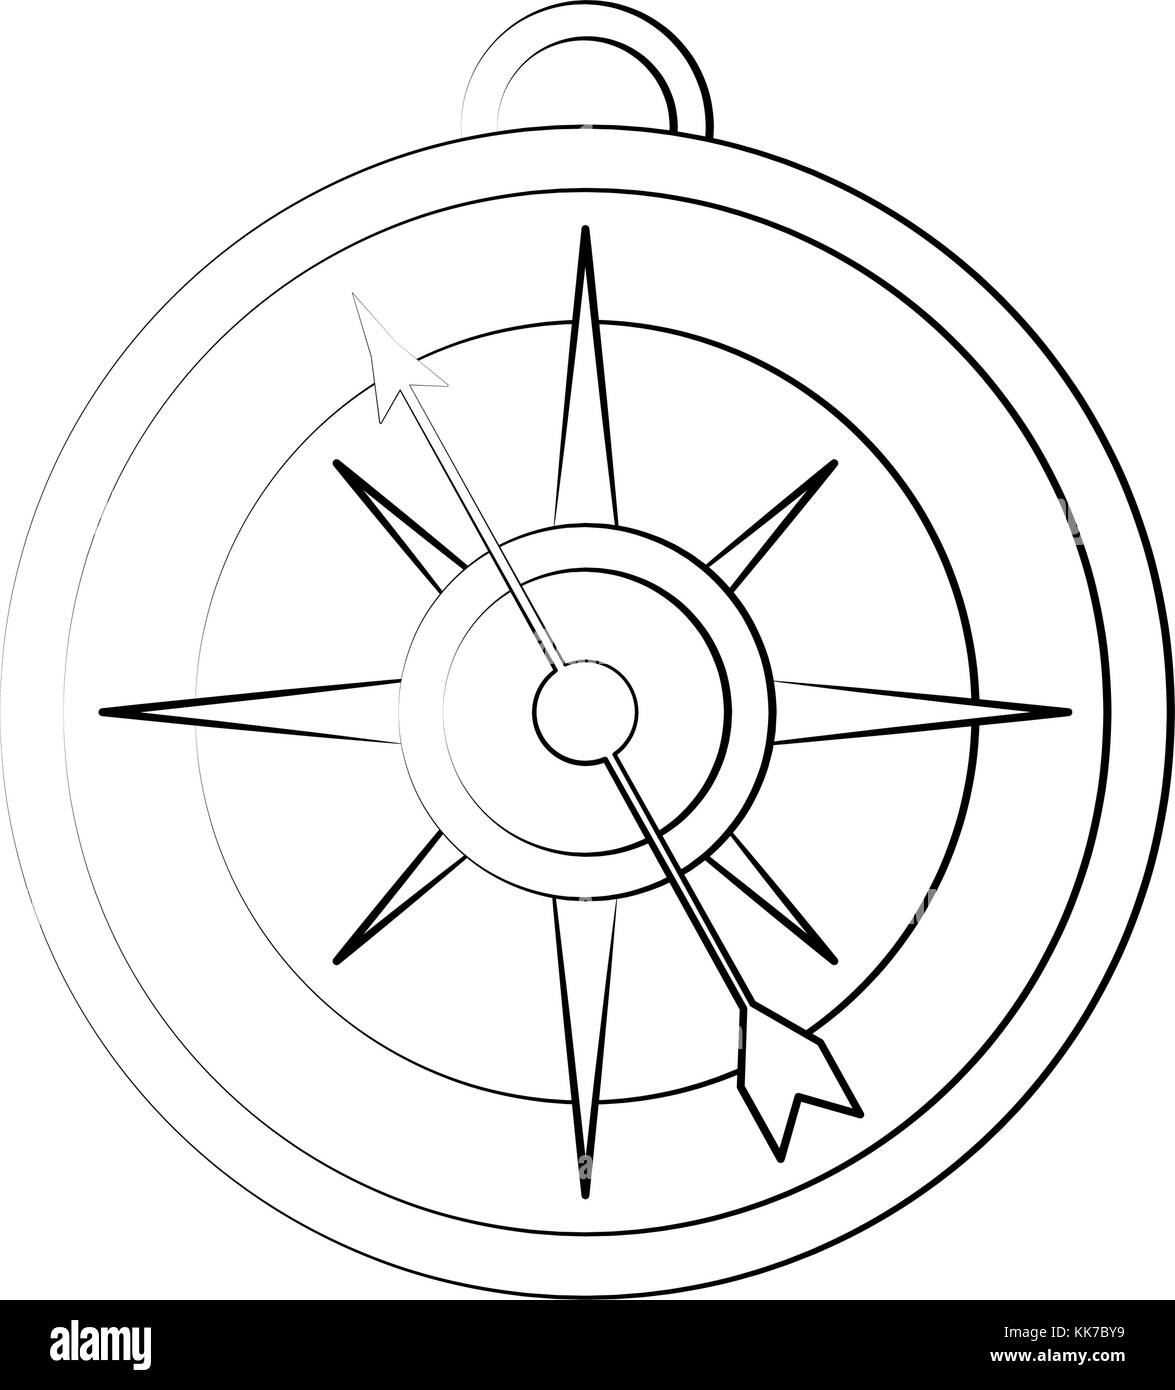 Old navigation compass - Stock Image